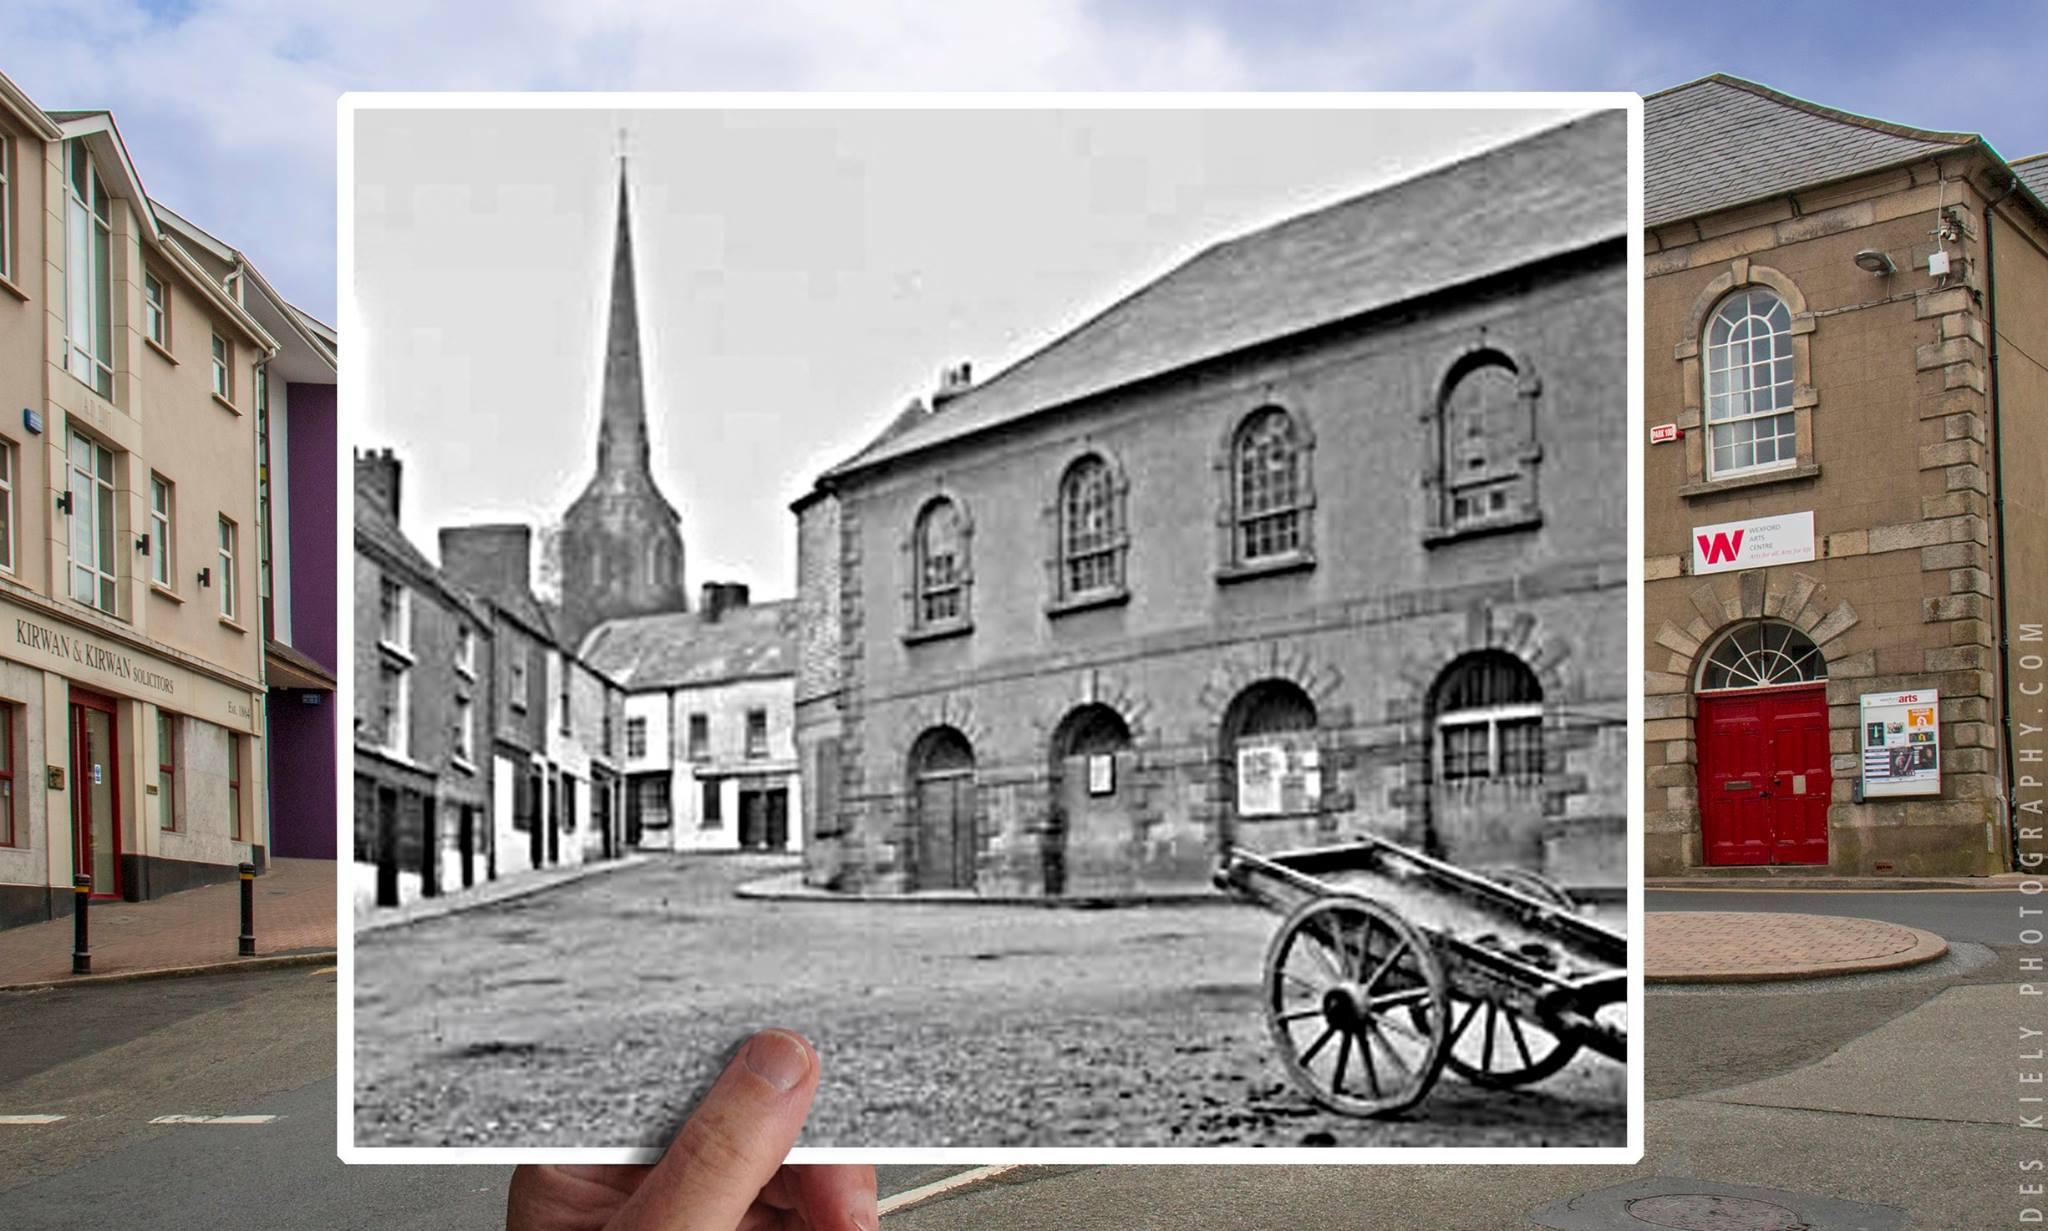 Cornmarket, Wexford